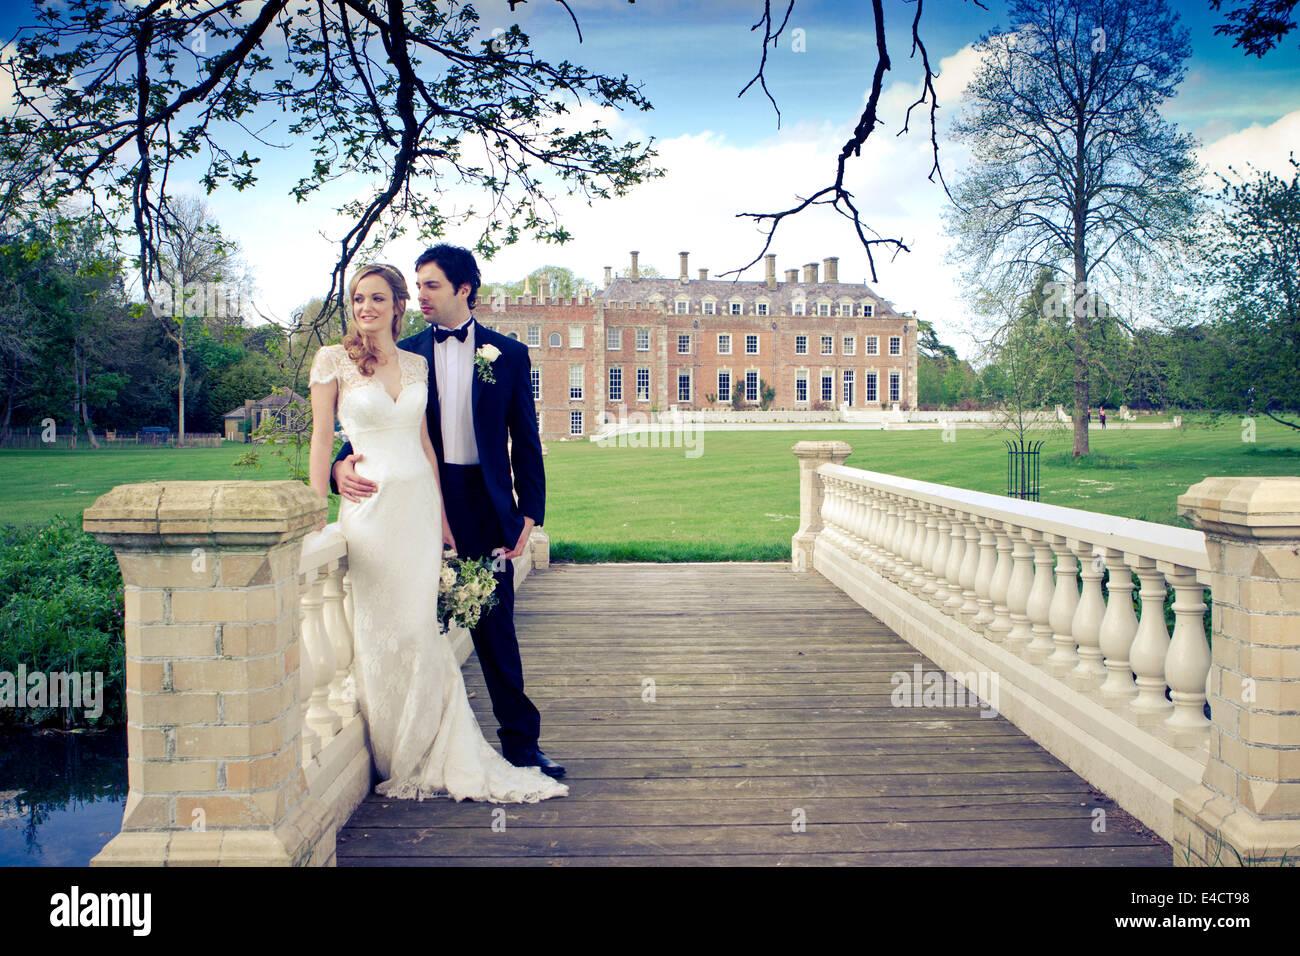 Wedding preparations, Bride and bridegroom on bridge in park, Dorset, England - Stock Image